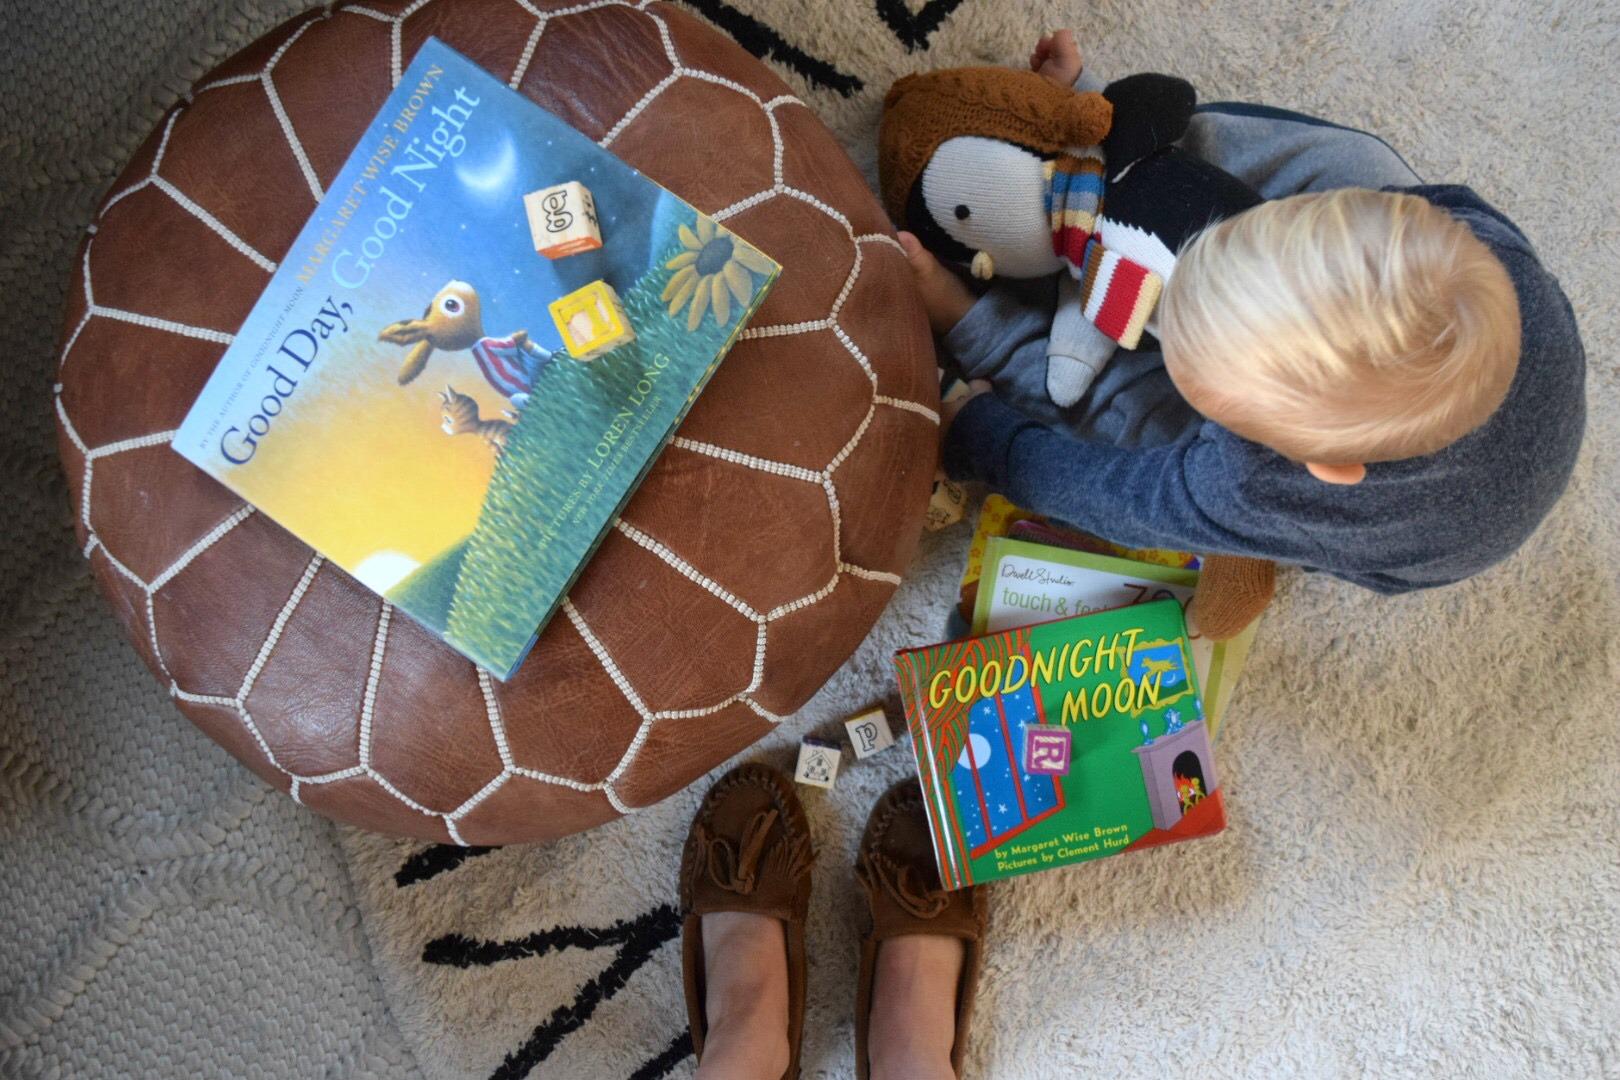 19 month Old Schedule Sleep Schedule with Good Day, Good Night Childrens Books